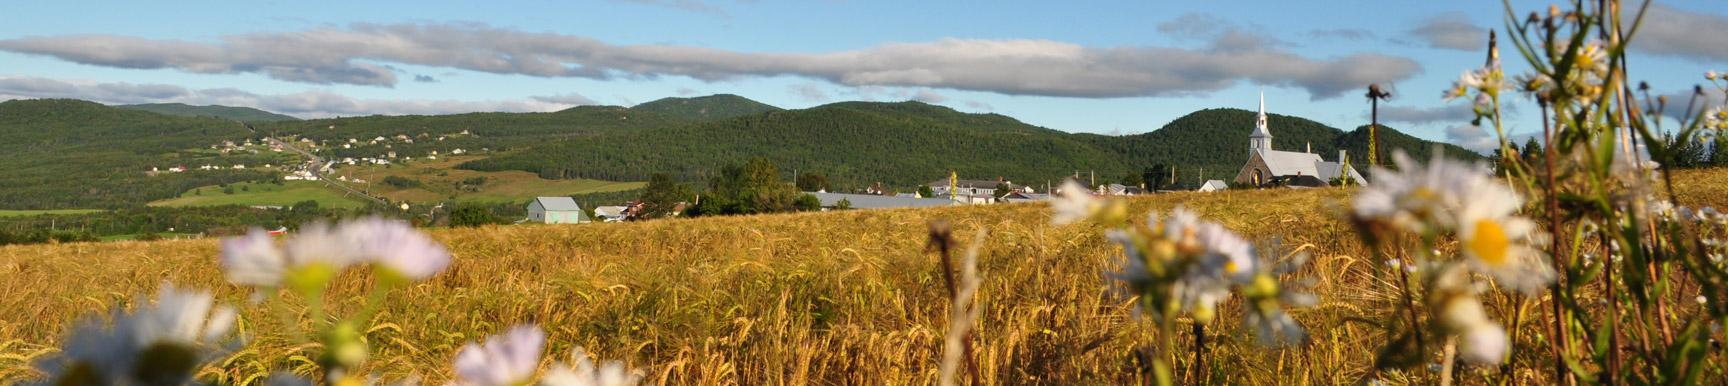 Paysages mrc de charlevoix for Emploi paysage